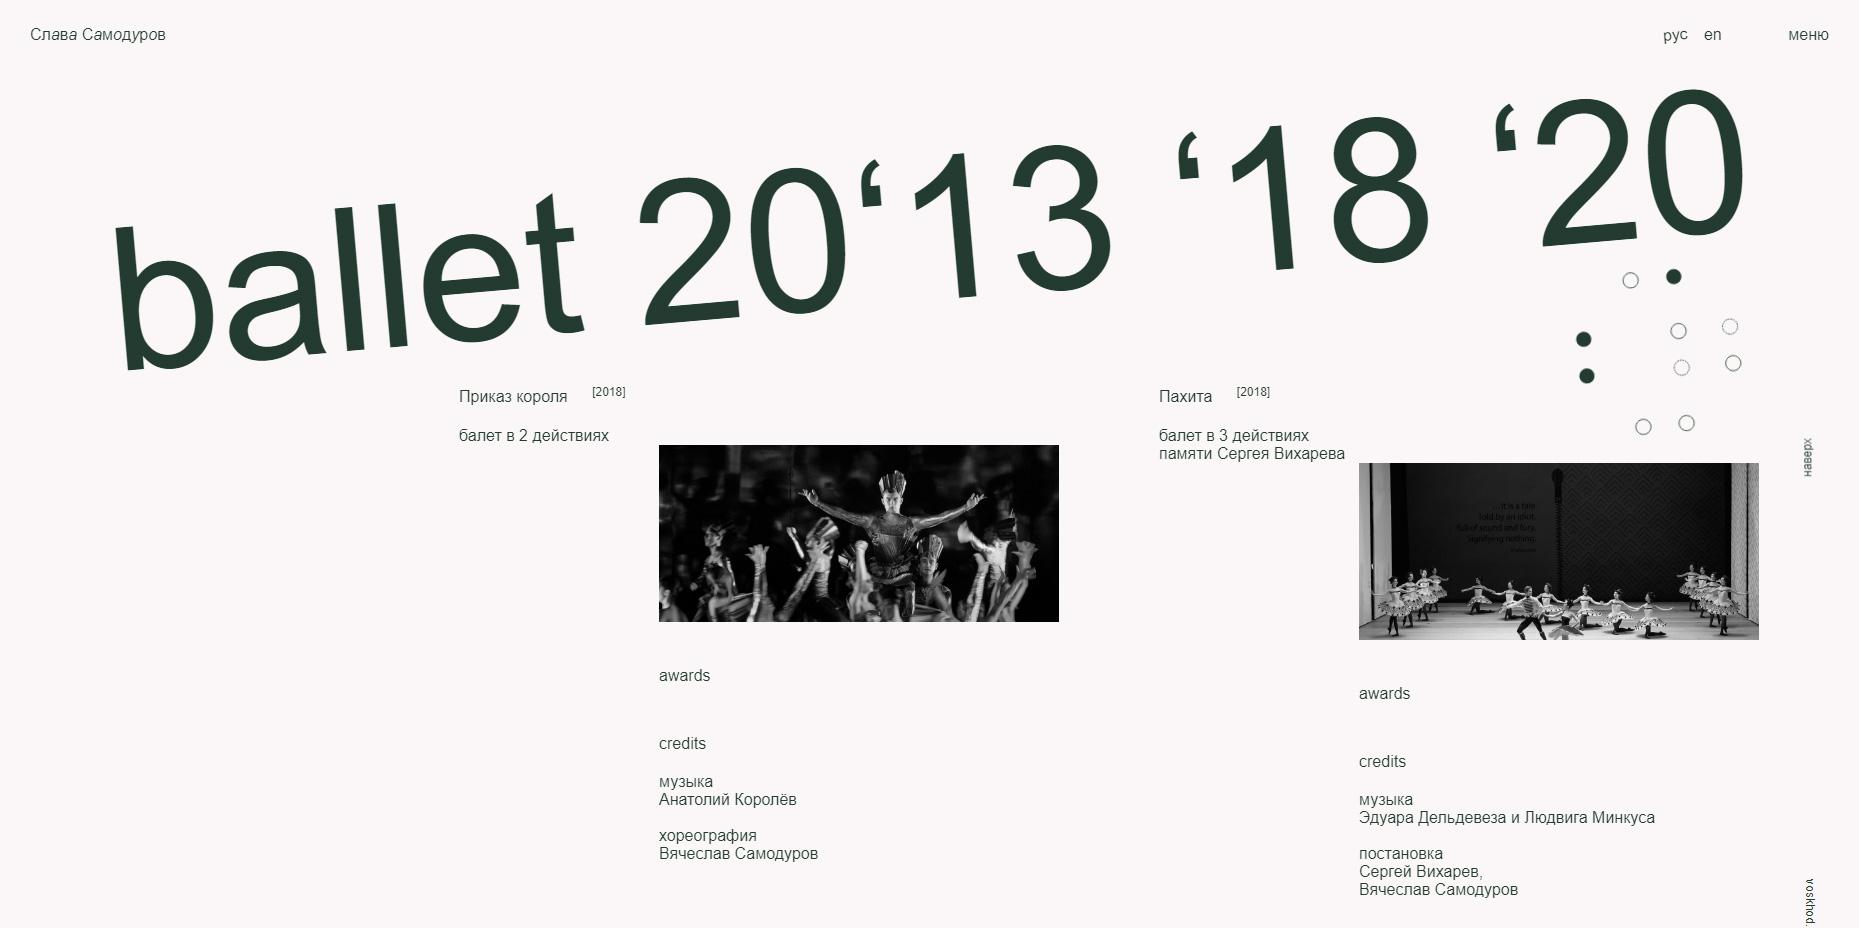 Slava Samodurov choreographer - Website of the Day